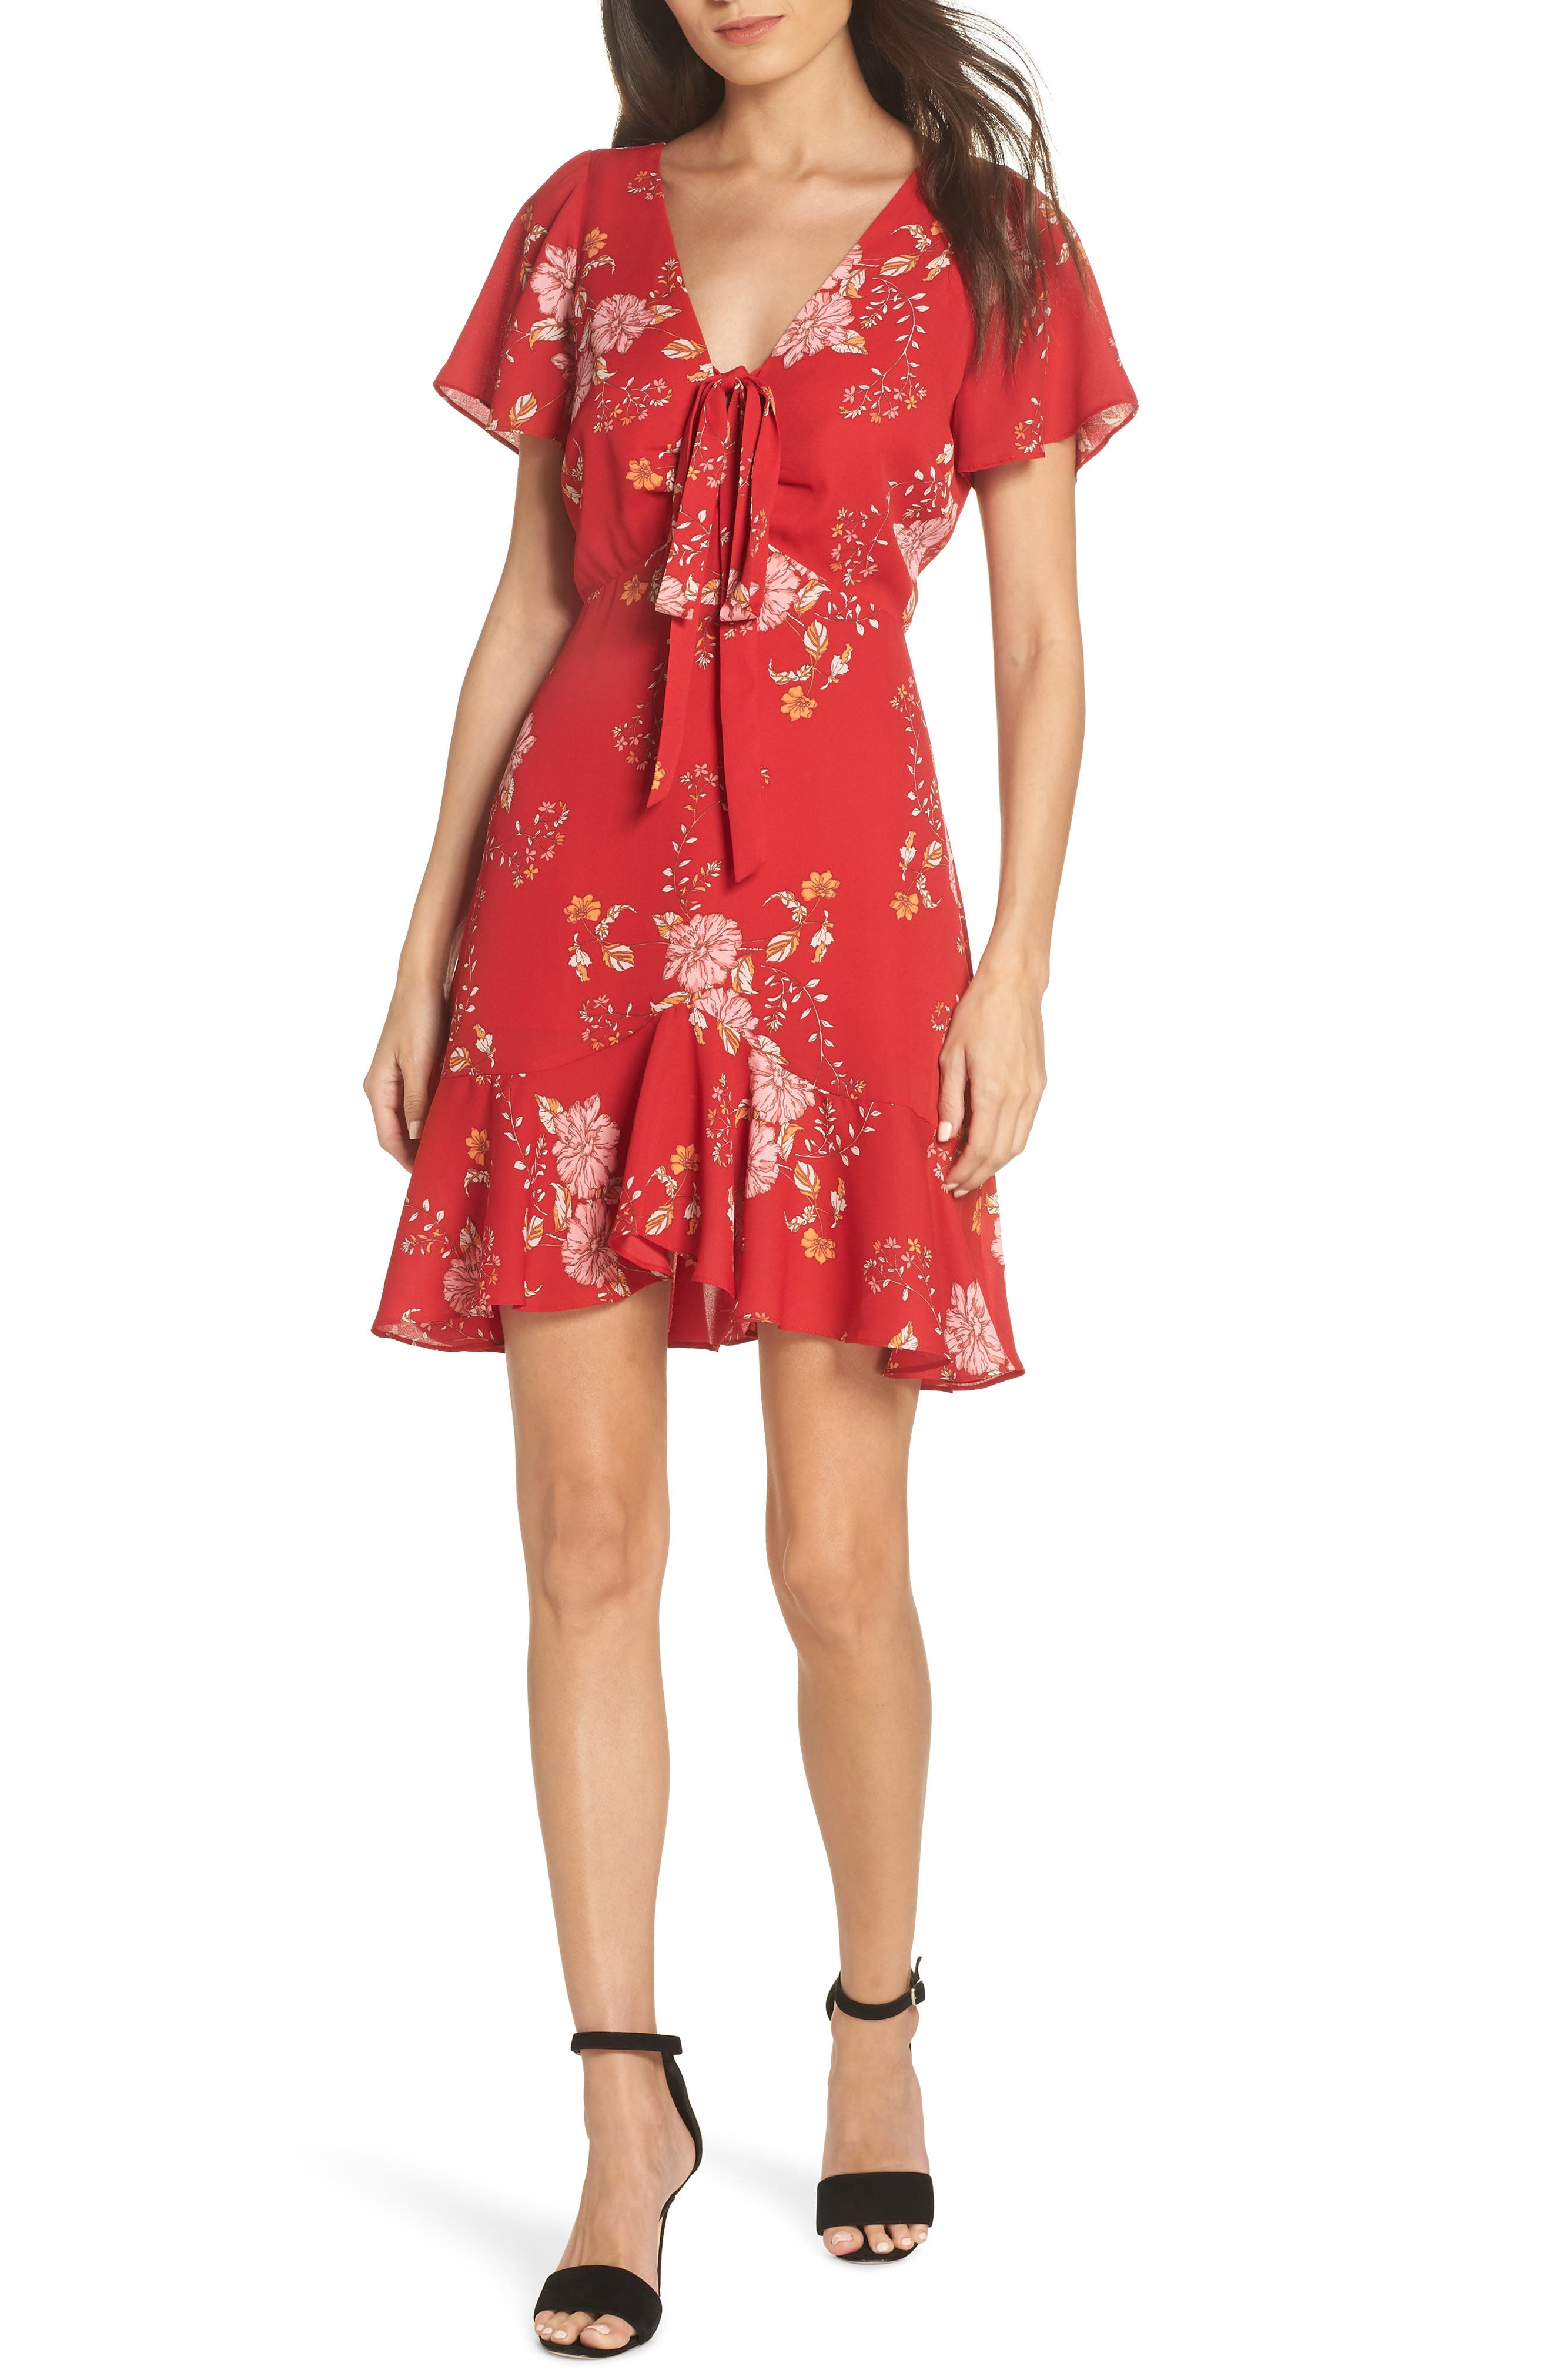 Bb Dakota Hyper Bloom Printed Minidress, Red